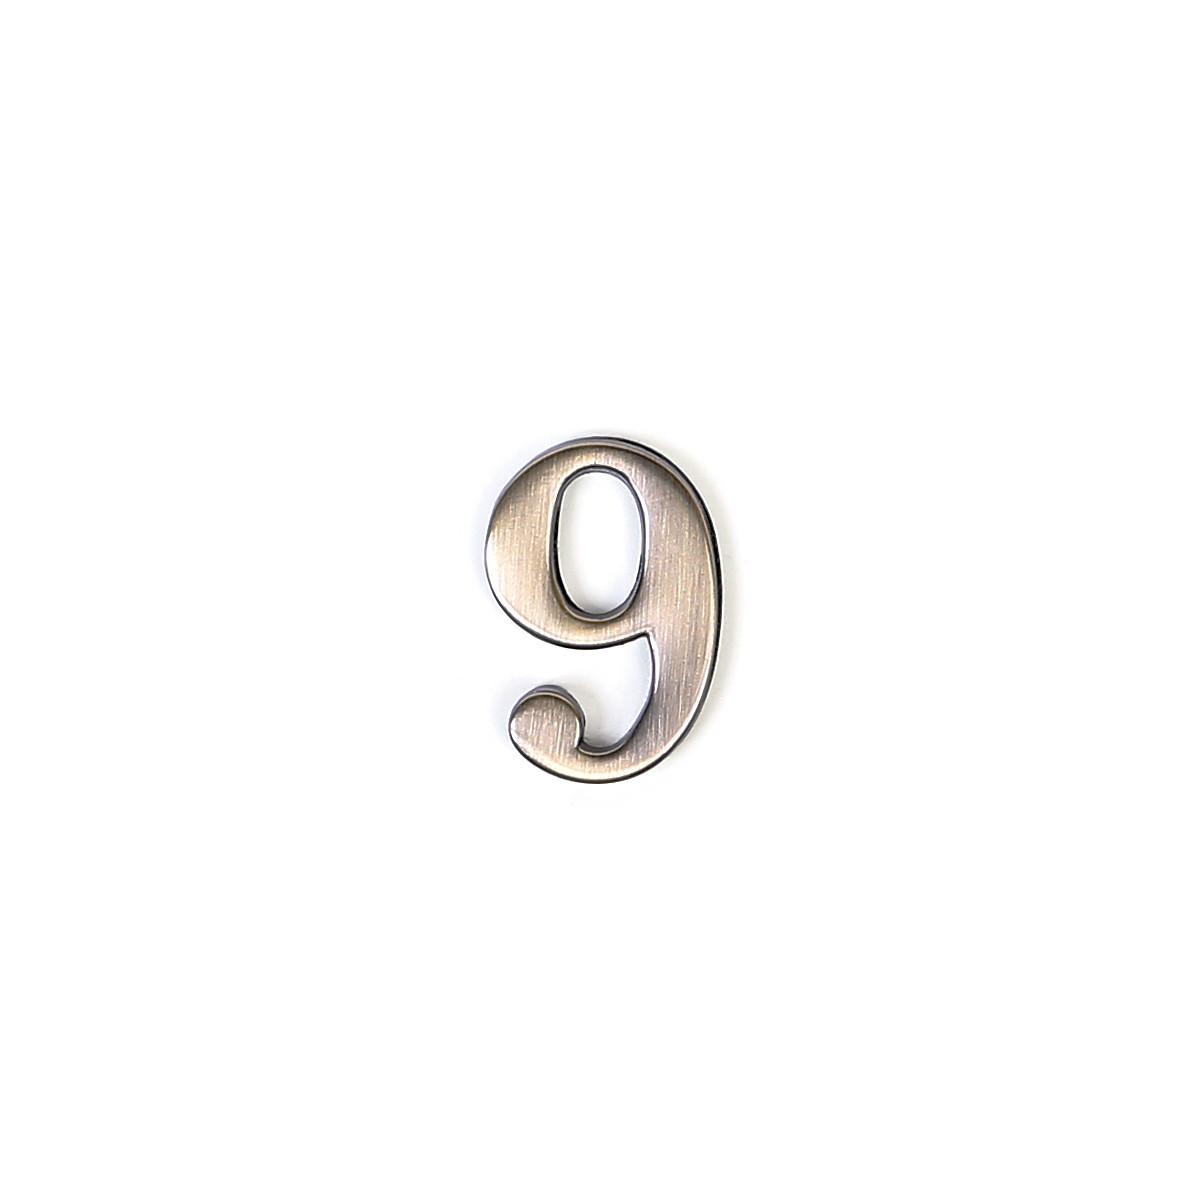 Номер на дверь из цинка Larvij цифра 9 антик бронза (GNZ4 AB #9)